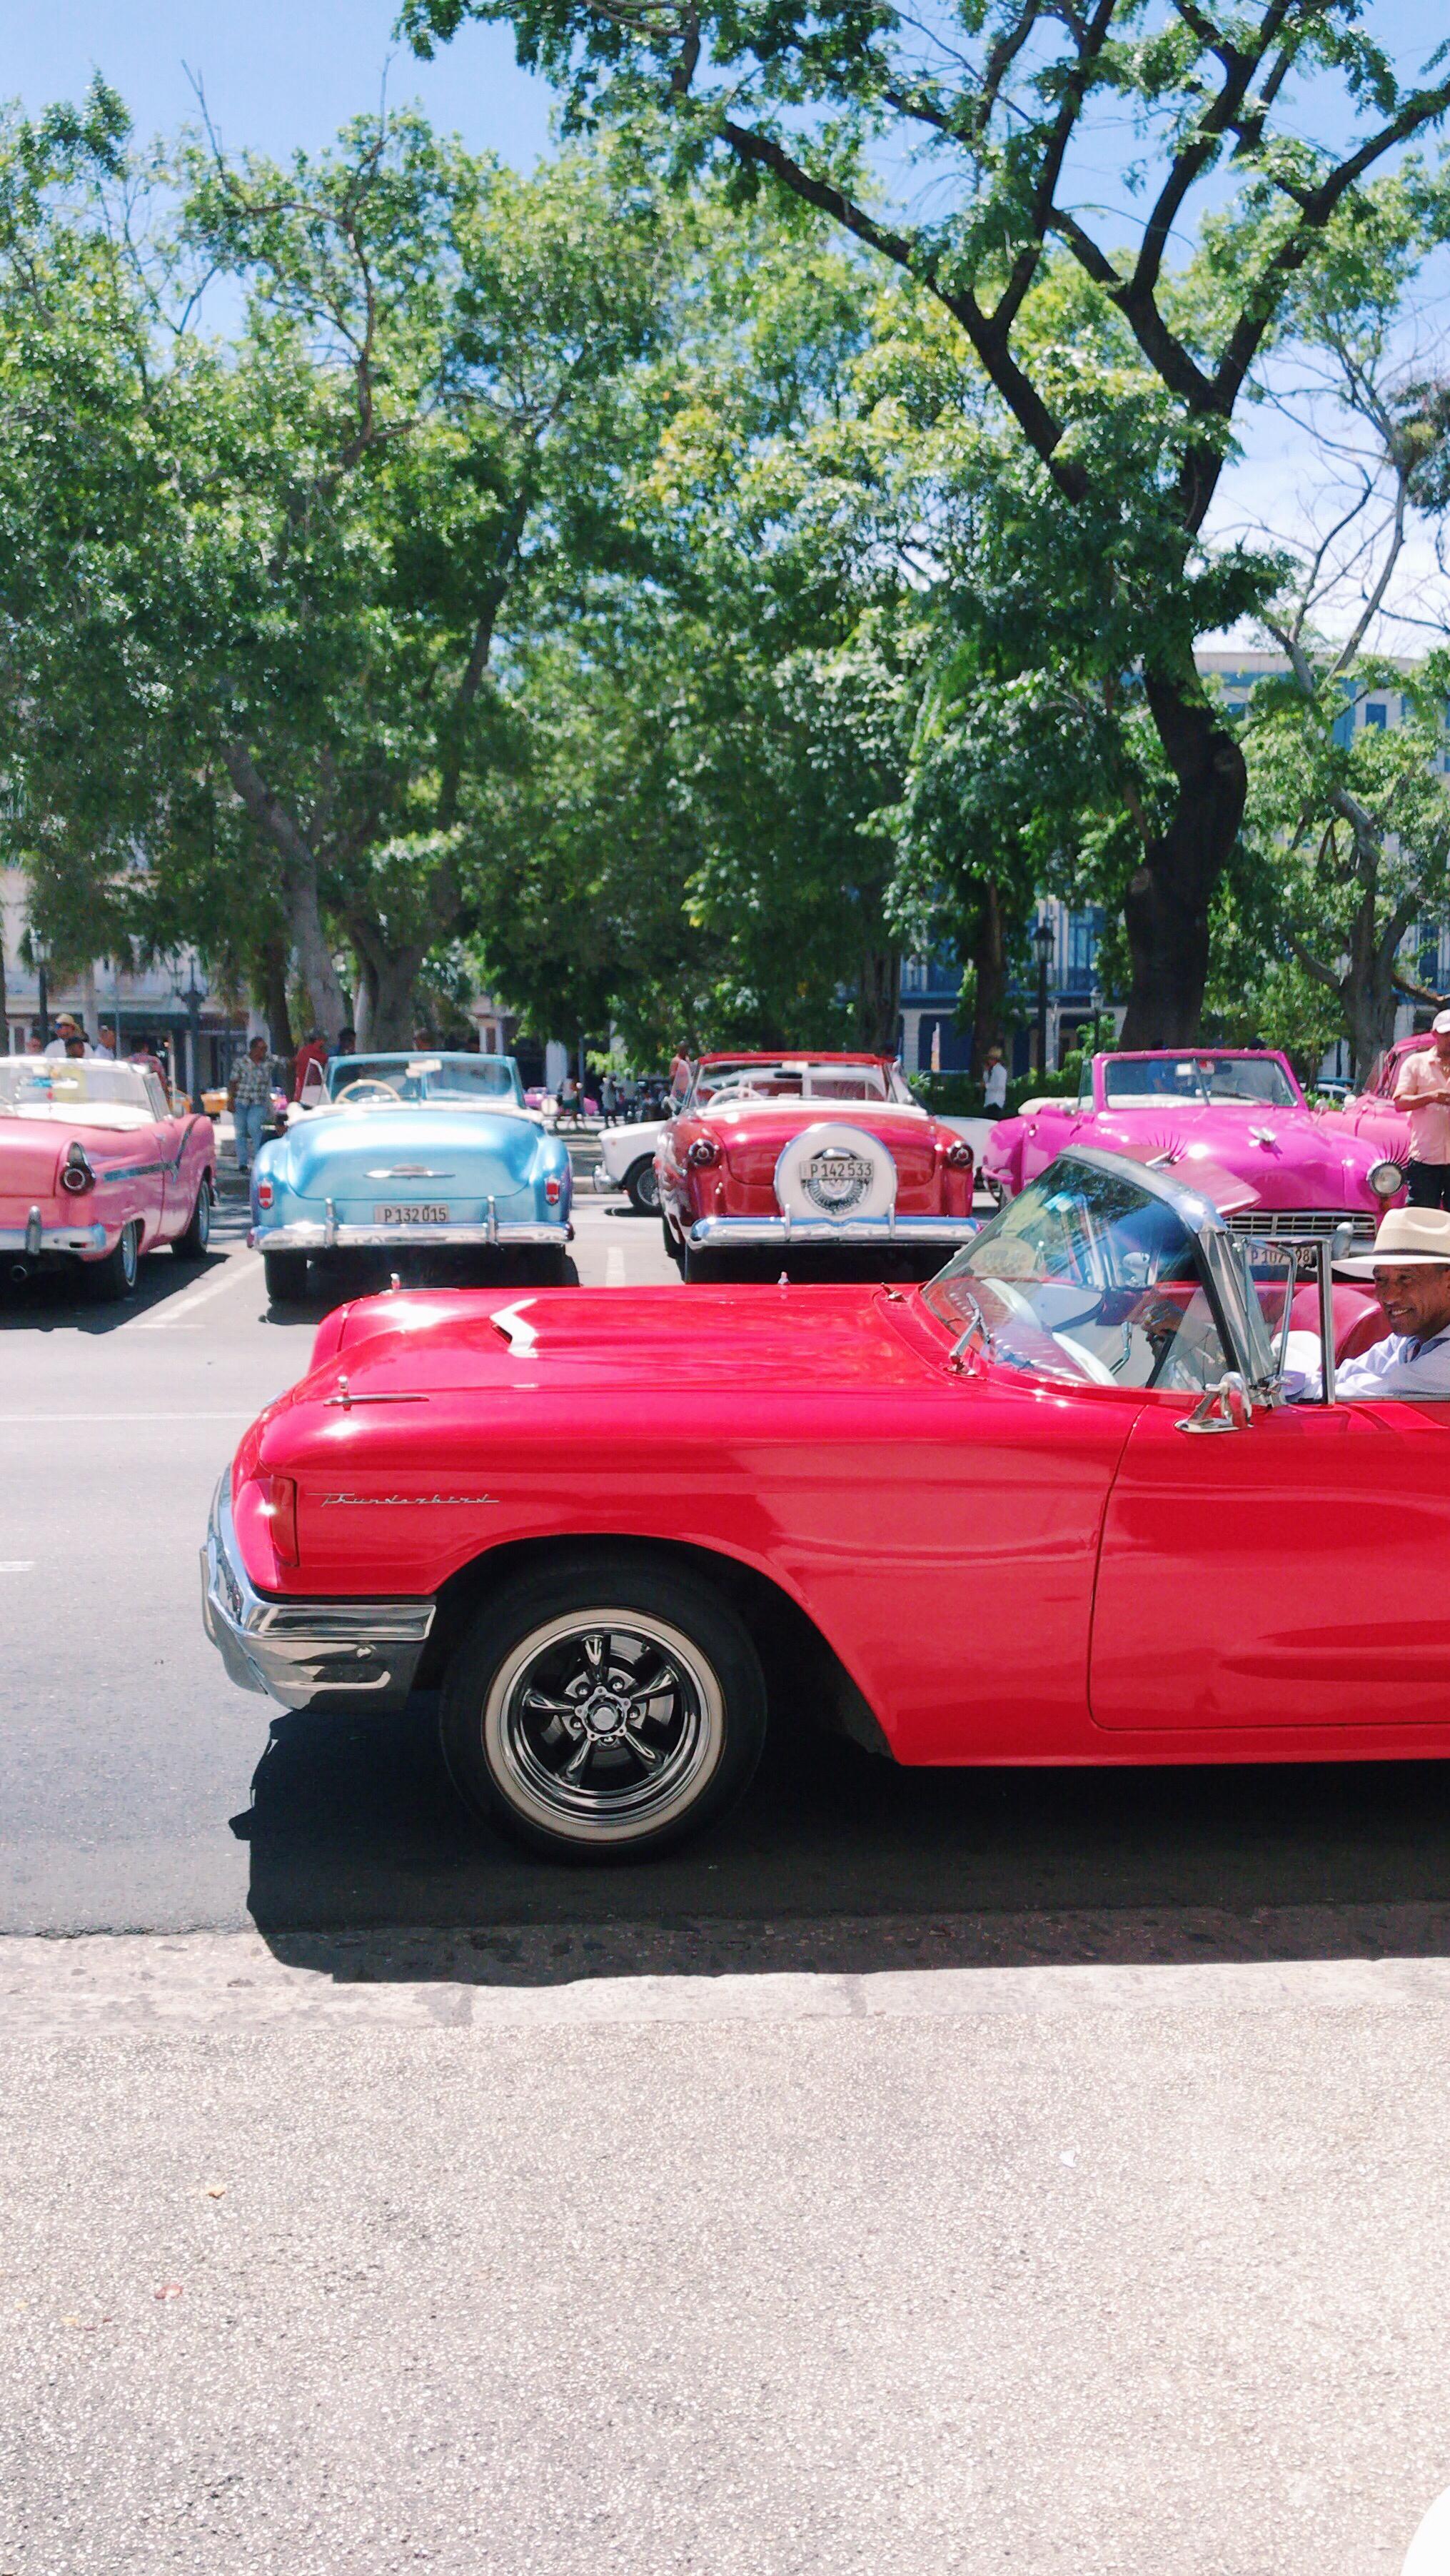 Beautiful Car in Havana, Cuba. HEBS talks about Cuba